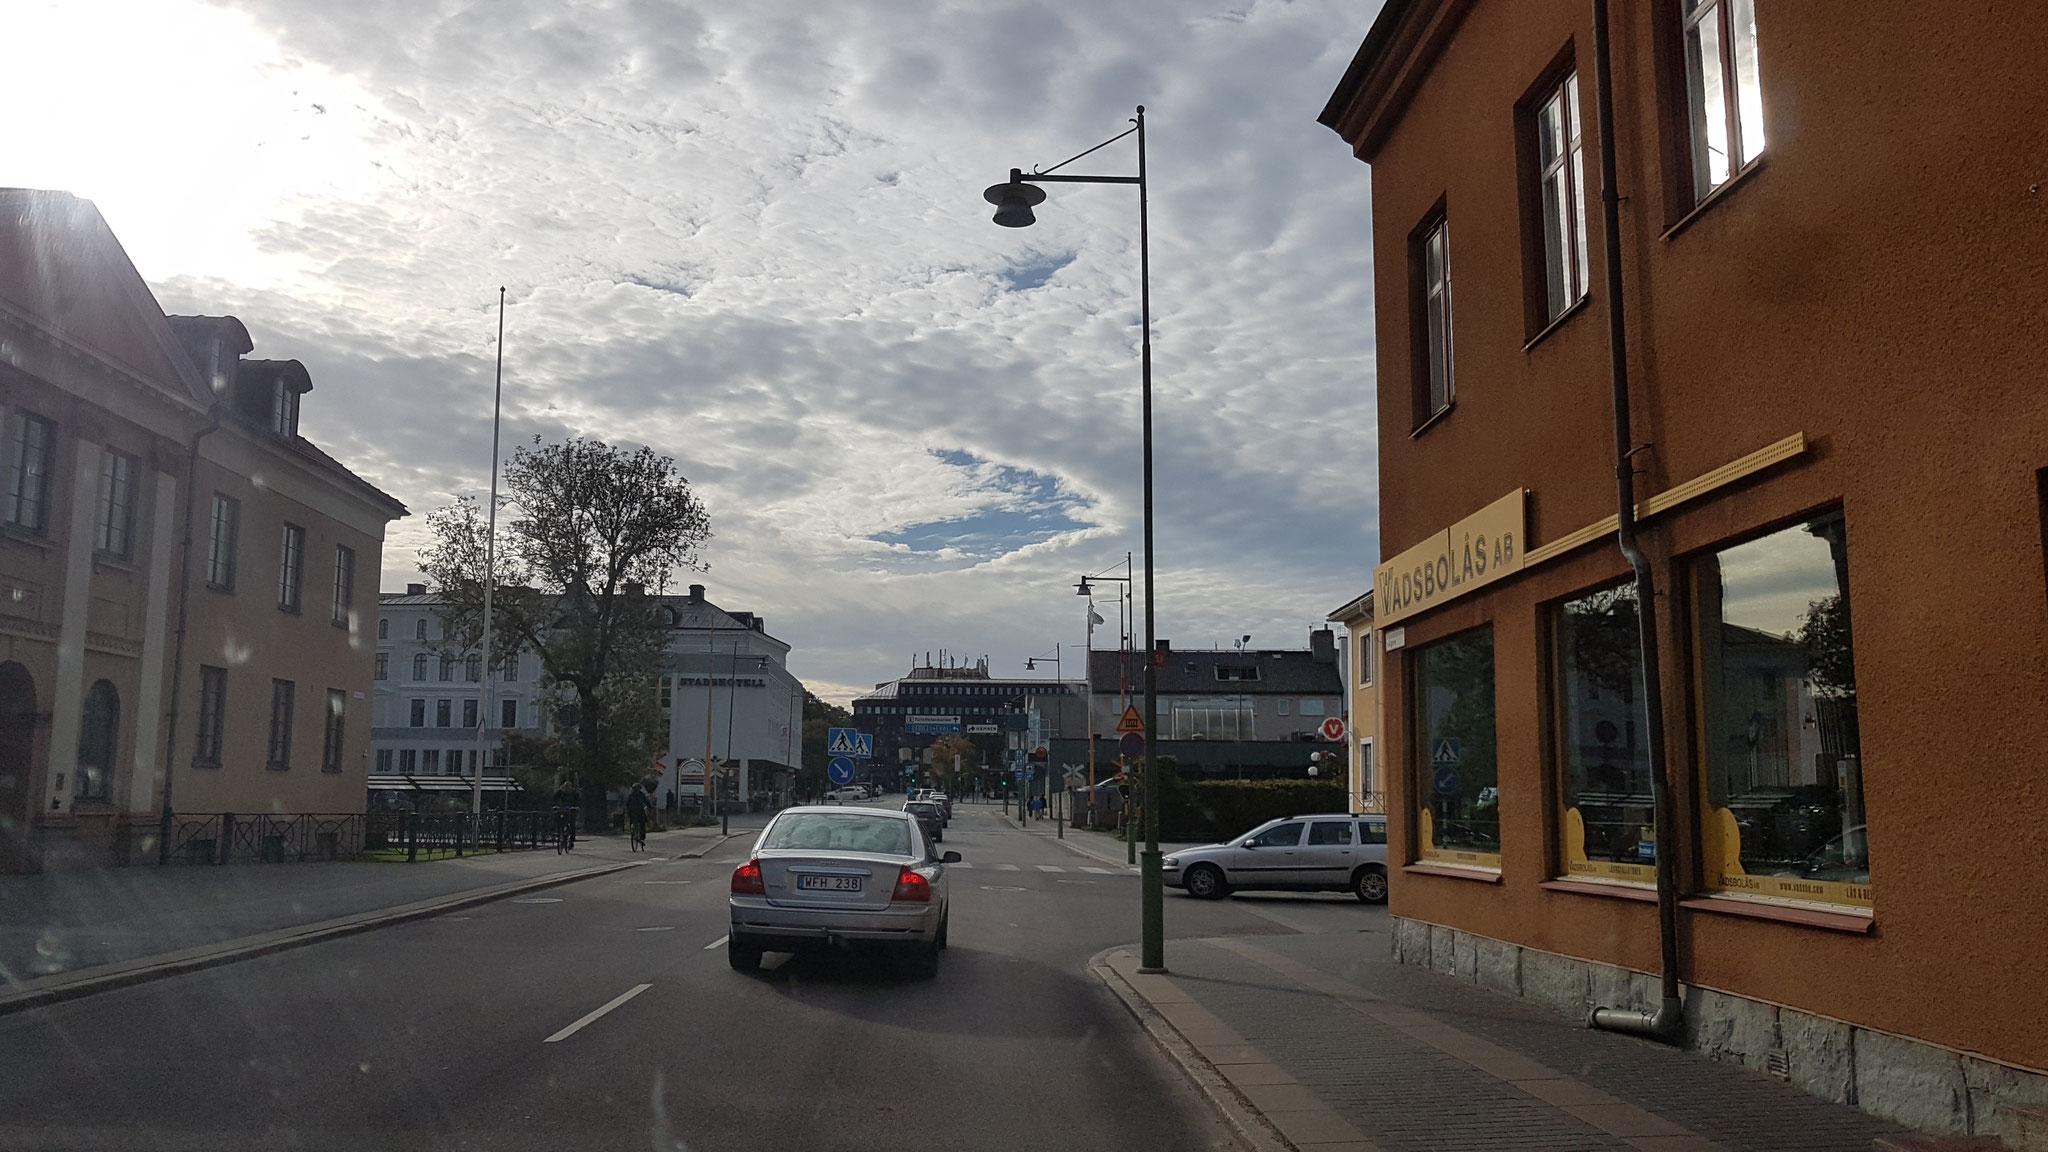 Ankunft in Mariestad...